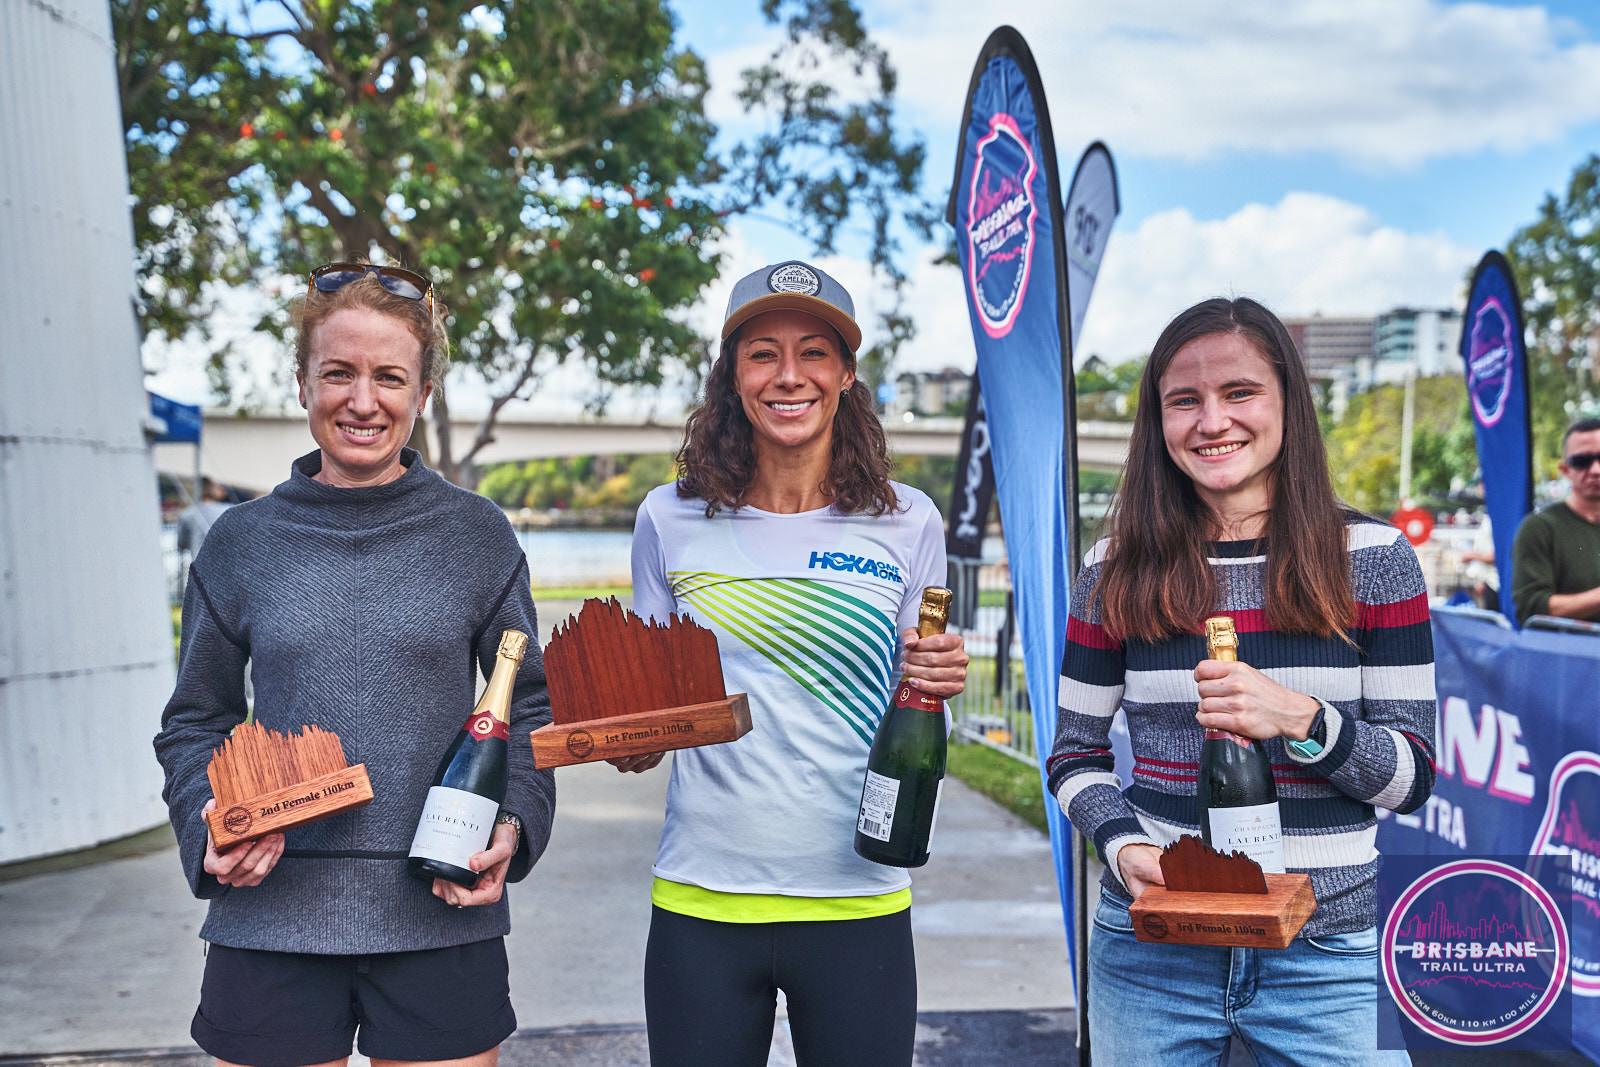 Women's 110km Podium, Jess Schulter 2nd, Kellie Emmerson 1st, Hannah McRae 3rd.